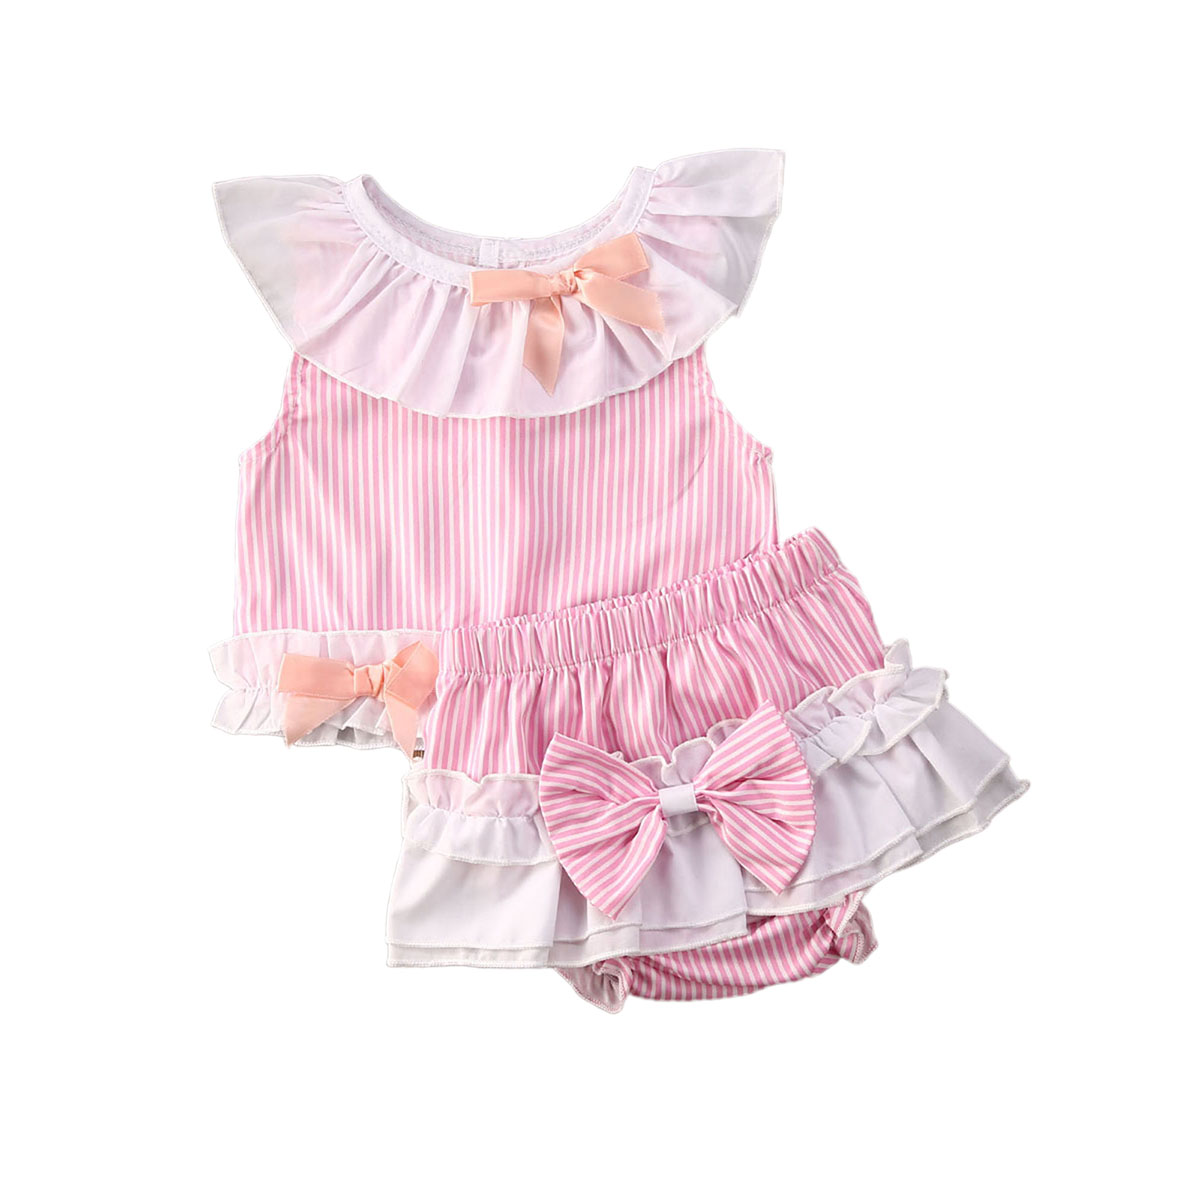 Newborn Infant Baby Girls Princess Summer Bow Short Sleeve T Shirts Tops+Shorts 2pcs Set 0-24M